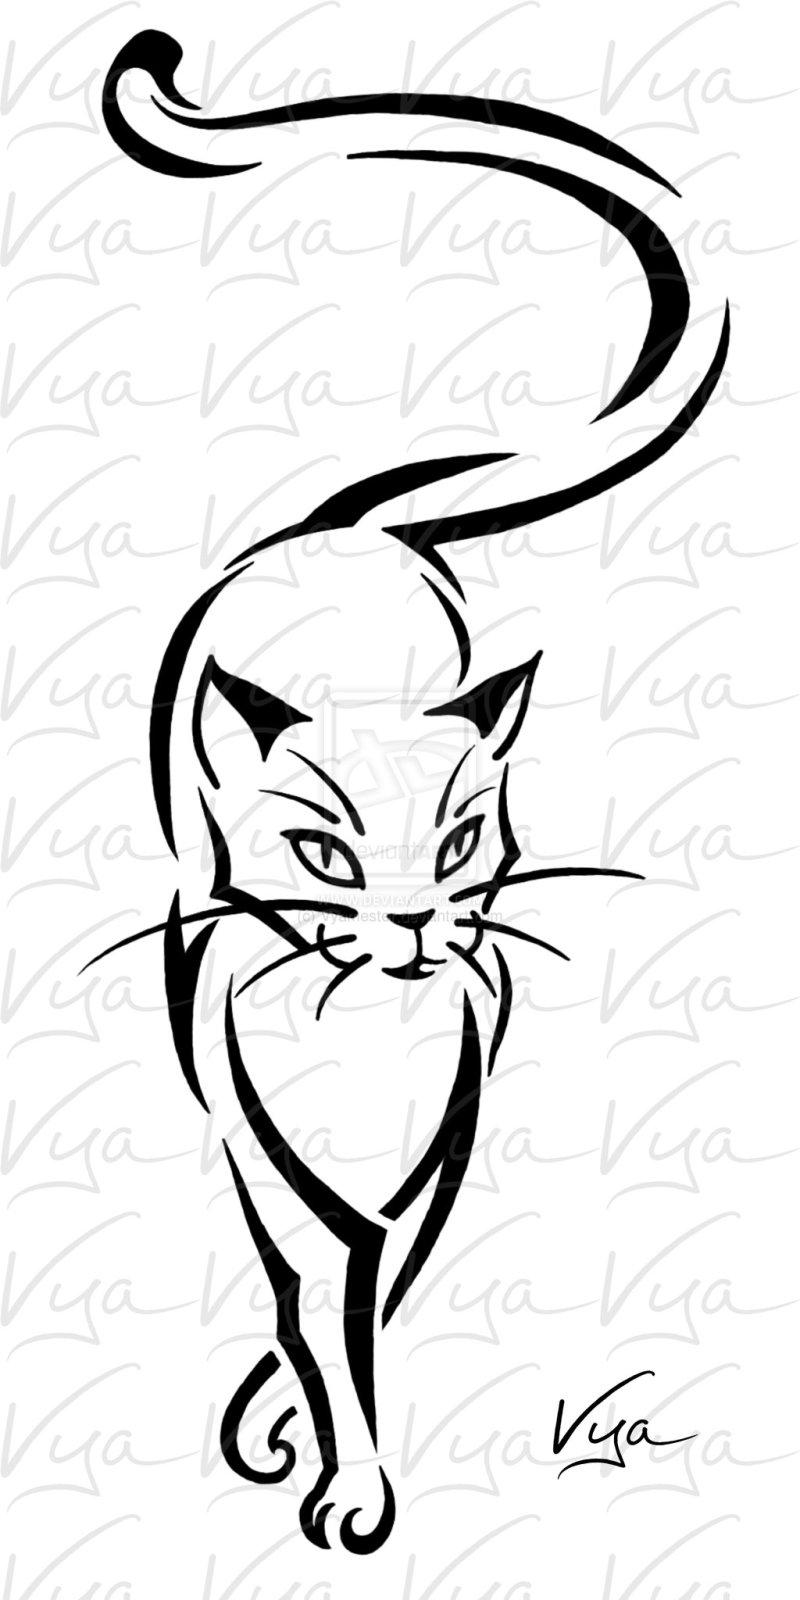 Wonderful cat tattoo design